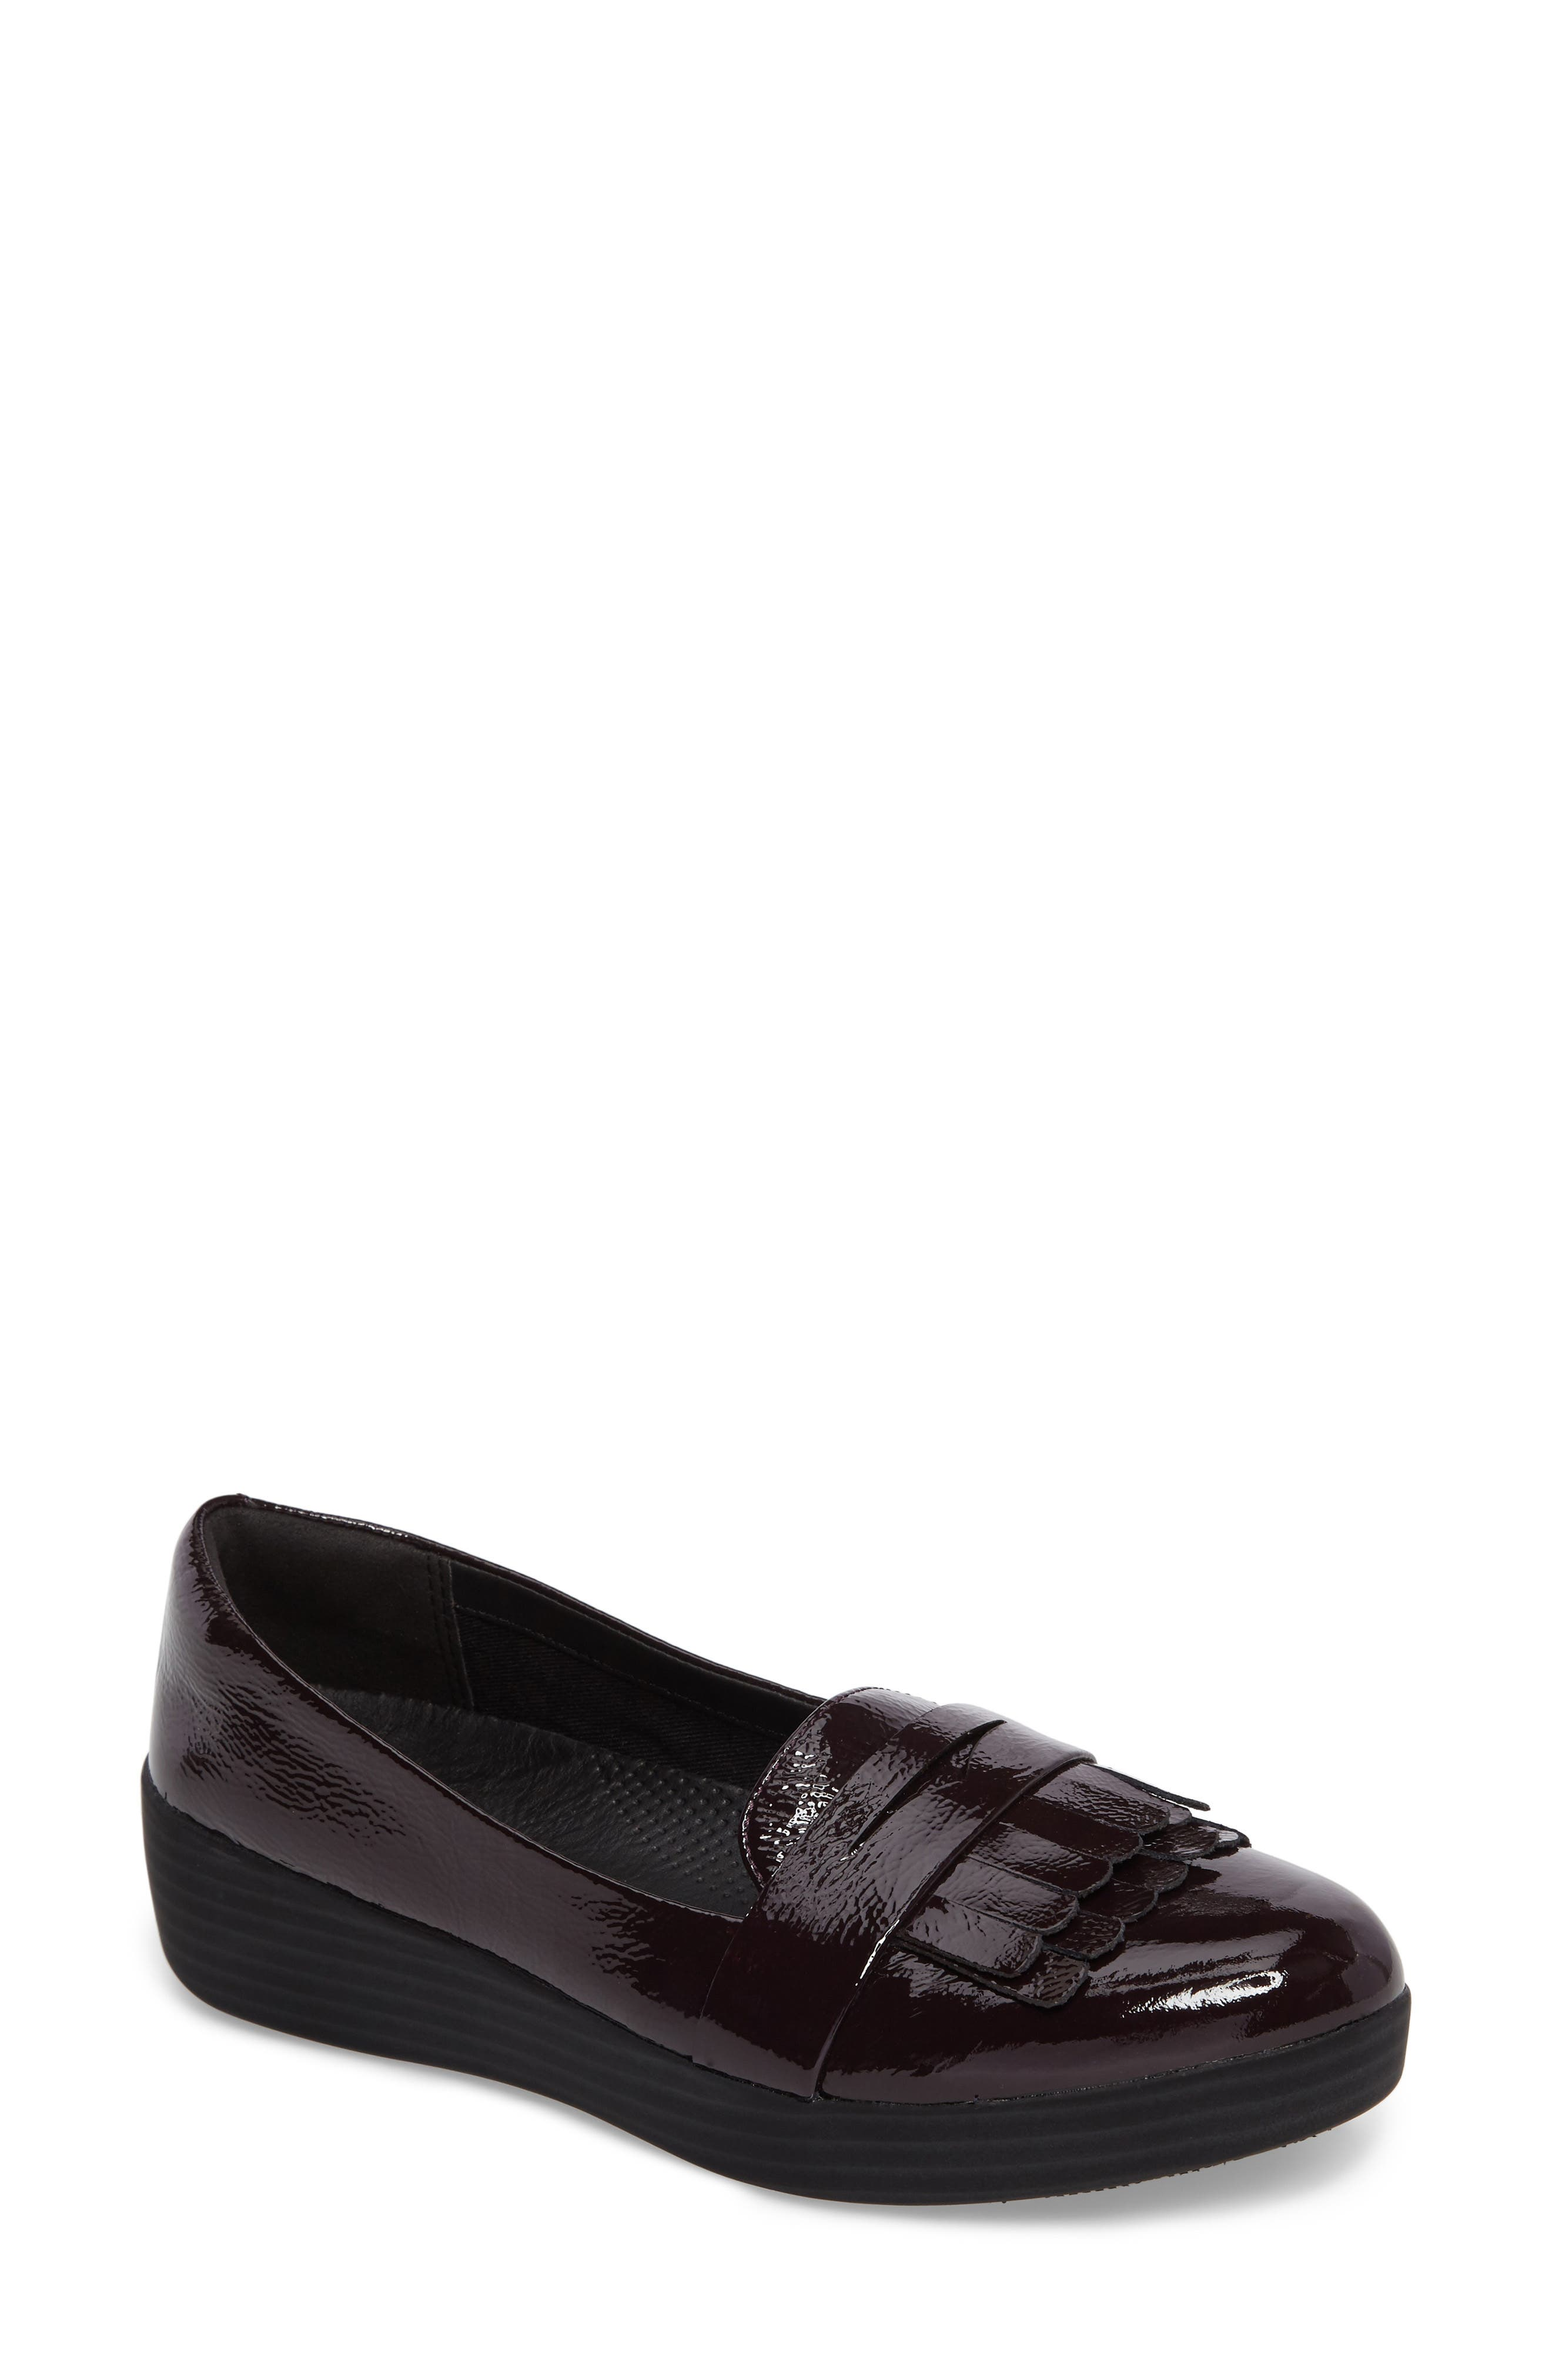 Fringey Sneakerloafer Slip-On,                         Main,                         color, Deep Plum Leather